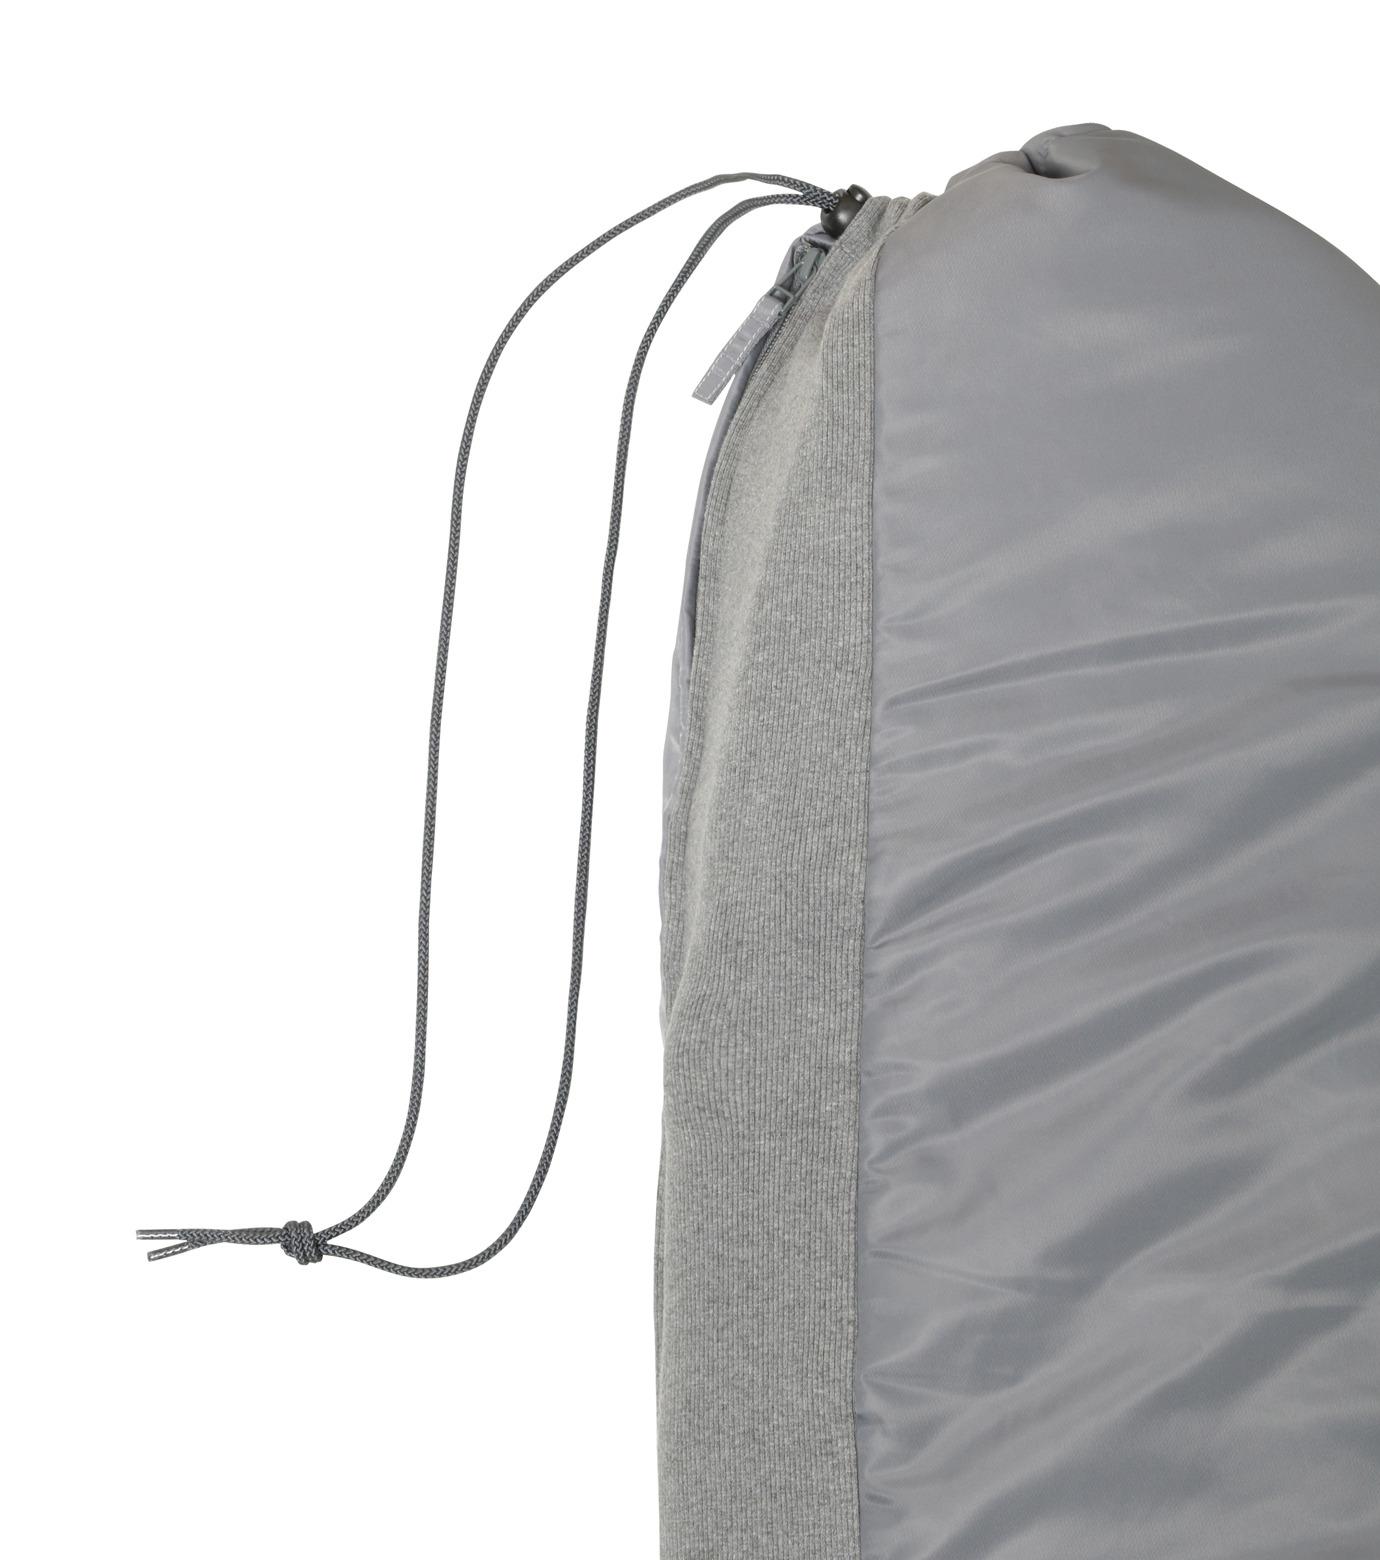 HEY YOU !(ヘイユウ)のSurfboard Jacket Short (S size)-GRAY(サーフ/OUTDOOR/surf/OUTDOOR)-18S90009-11 拡大詳細画像4